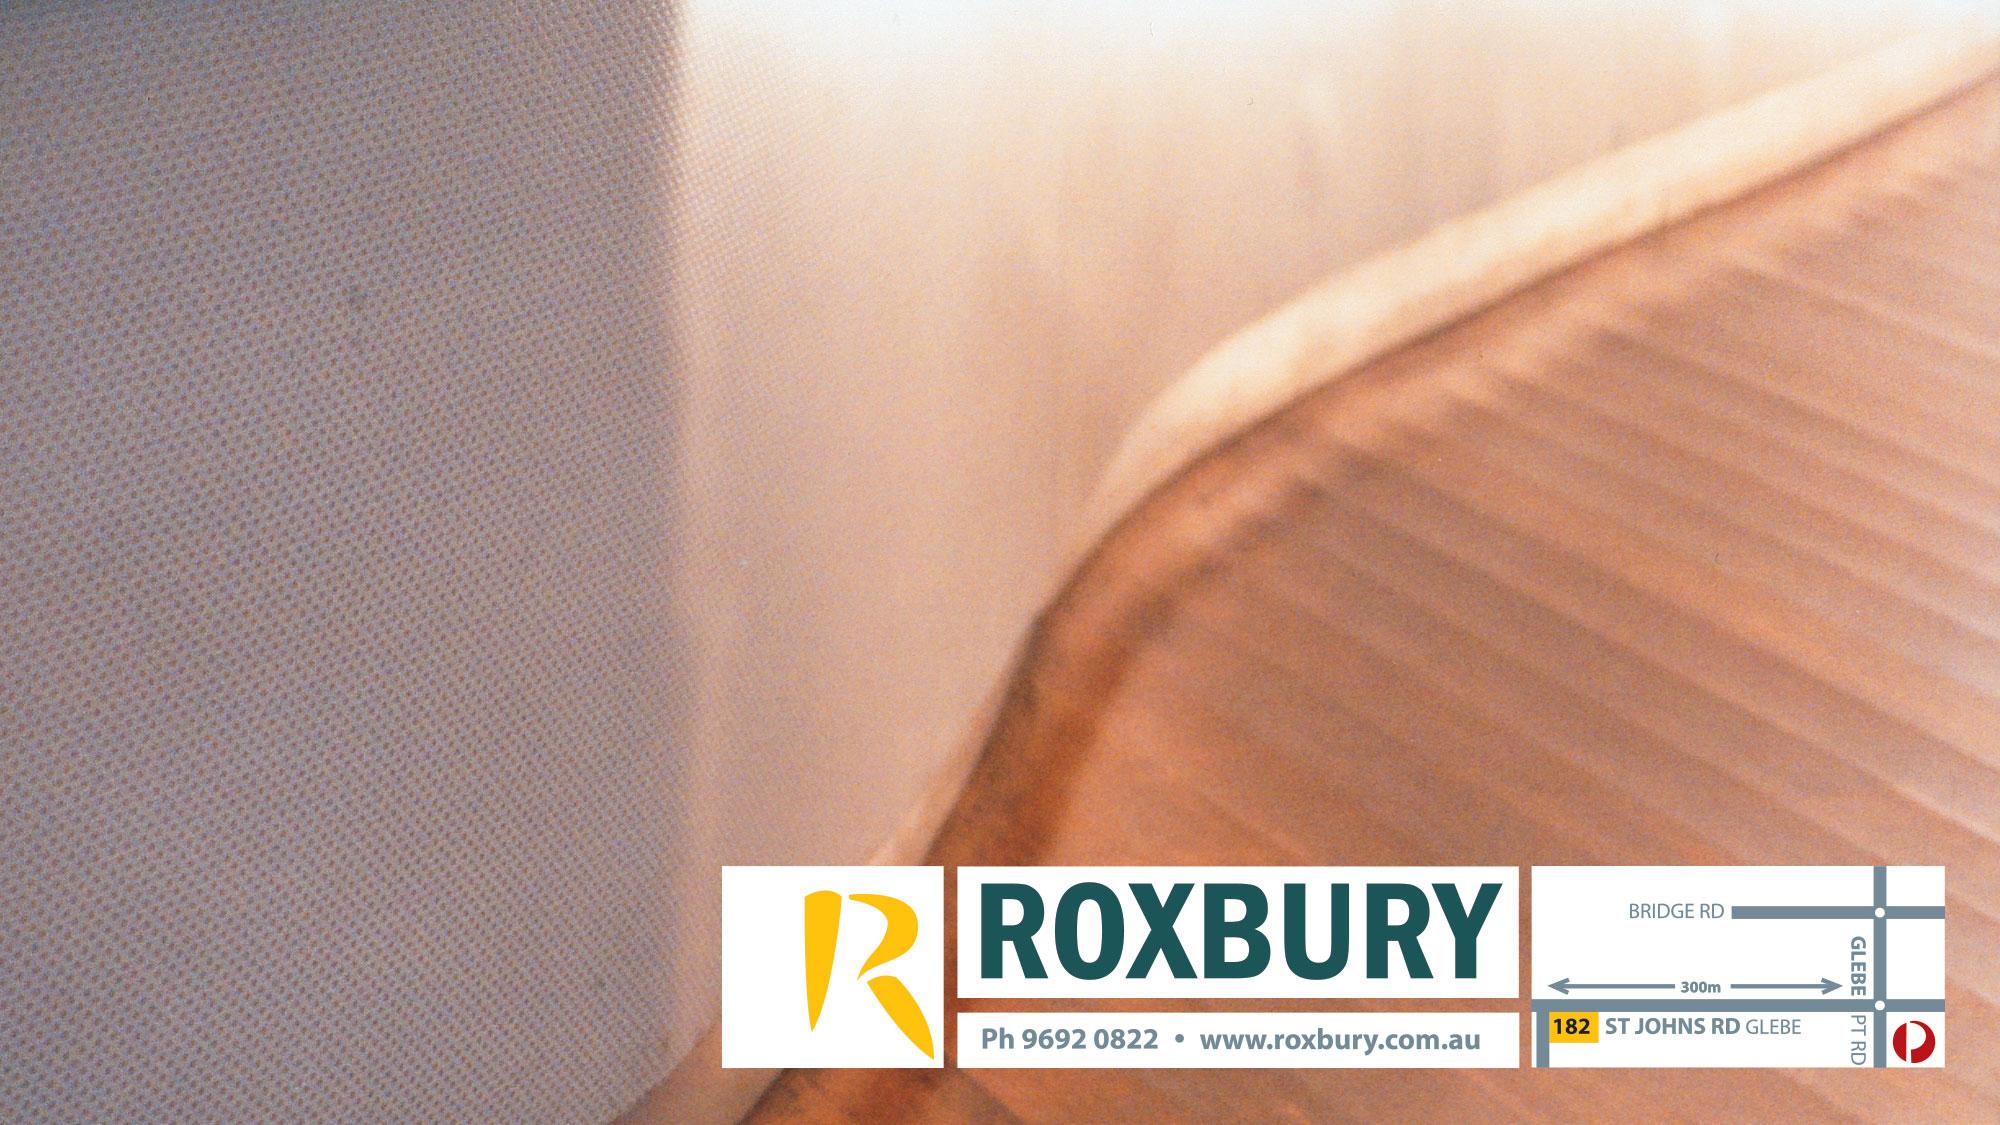 Print / Photo: Roxbury - branding